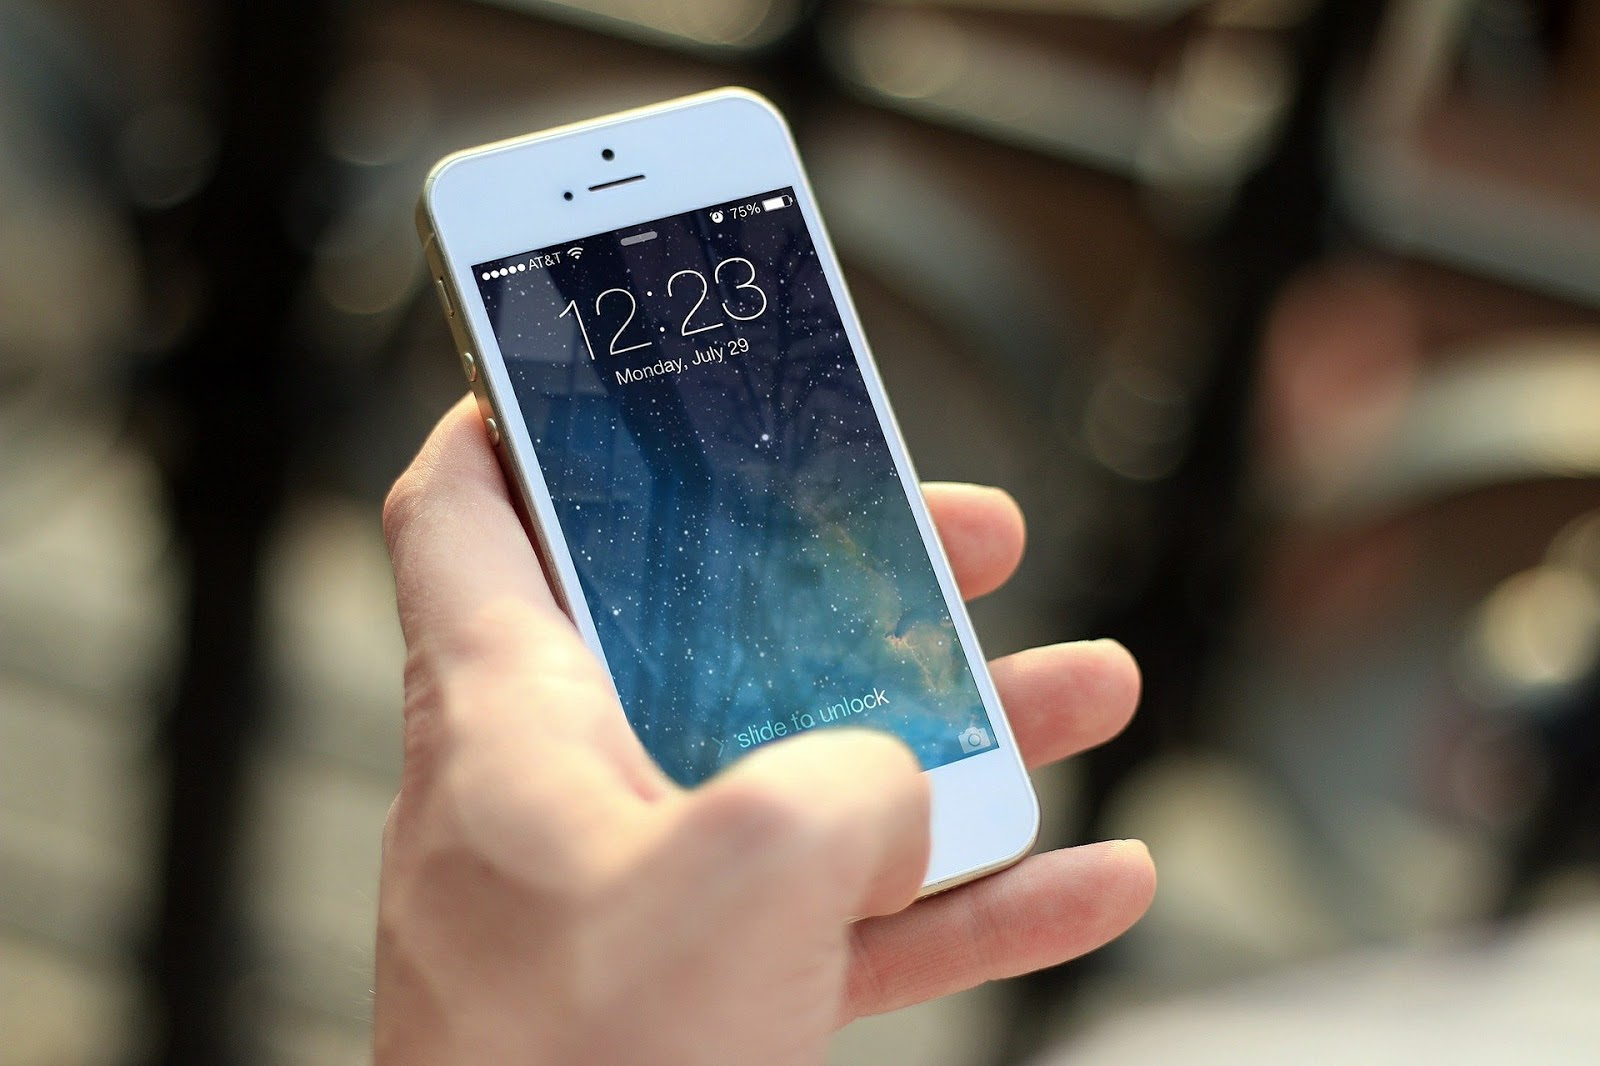 oppo reno 5g,oppo,oppo 5g,oppo reno,oppo reno 3 5g,oppo reno review,oppo reno 3 pro 5g,oppo 5g mobile price,5g,oppo reno 3 pro 5g unboxing,oppo reno 3,oppo reno 3 pro,oppo reno 10x zoom,oppo 5g mobile,oppo 5g mobile 218,oppo 5g mobile 2019,oppo 5g mobile 2018,oppo 5g mobile rate,oppo 5g mobile phone,oppo reno 5g review,oppo reno camera,oppo 5g network mobile,oppo reno unboxing